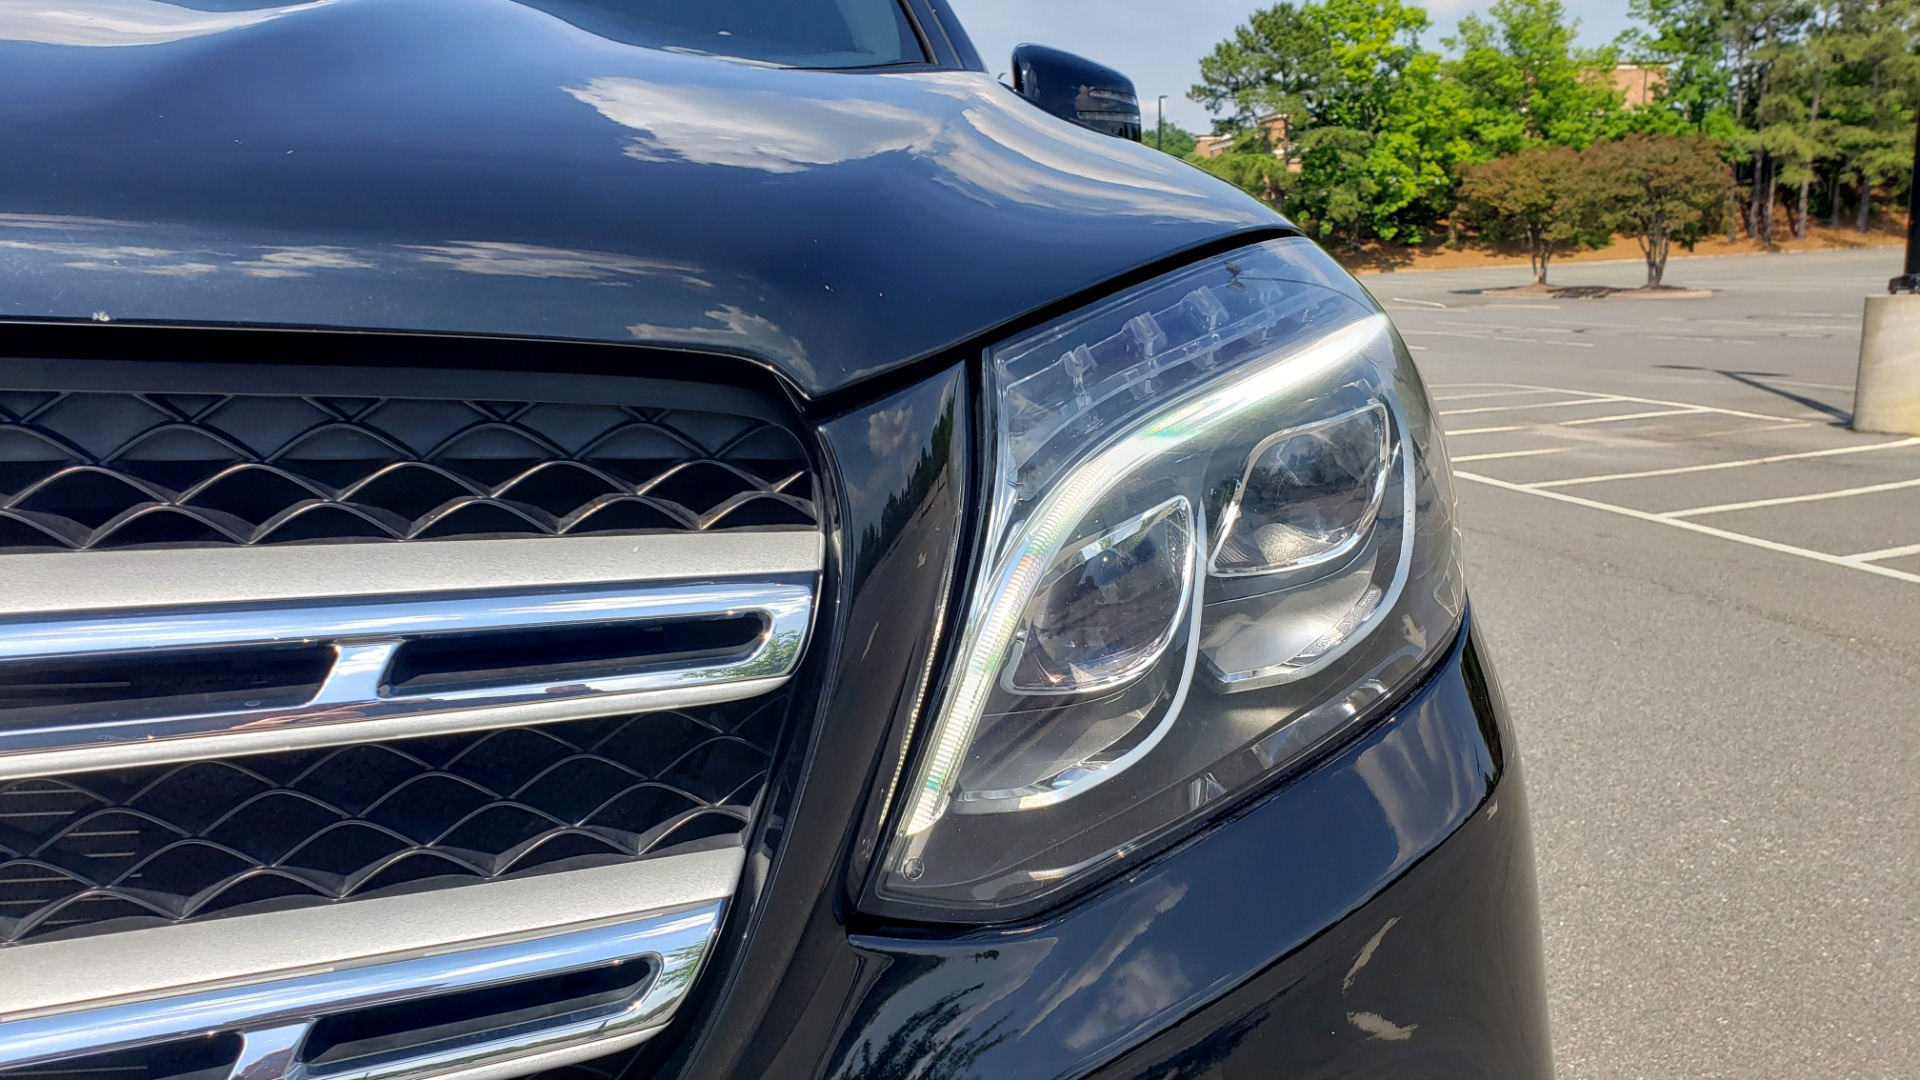 Used 2017 Mercedes-Benz GLS GLS 550 for sale Sold at Formula Imports in Charlotte NC 28227 30